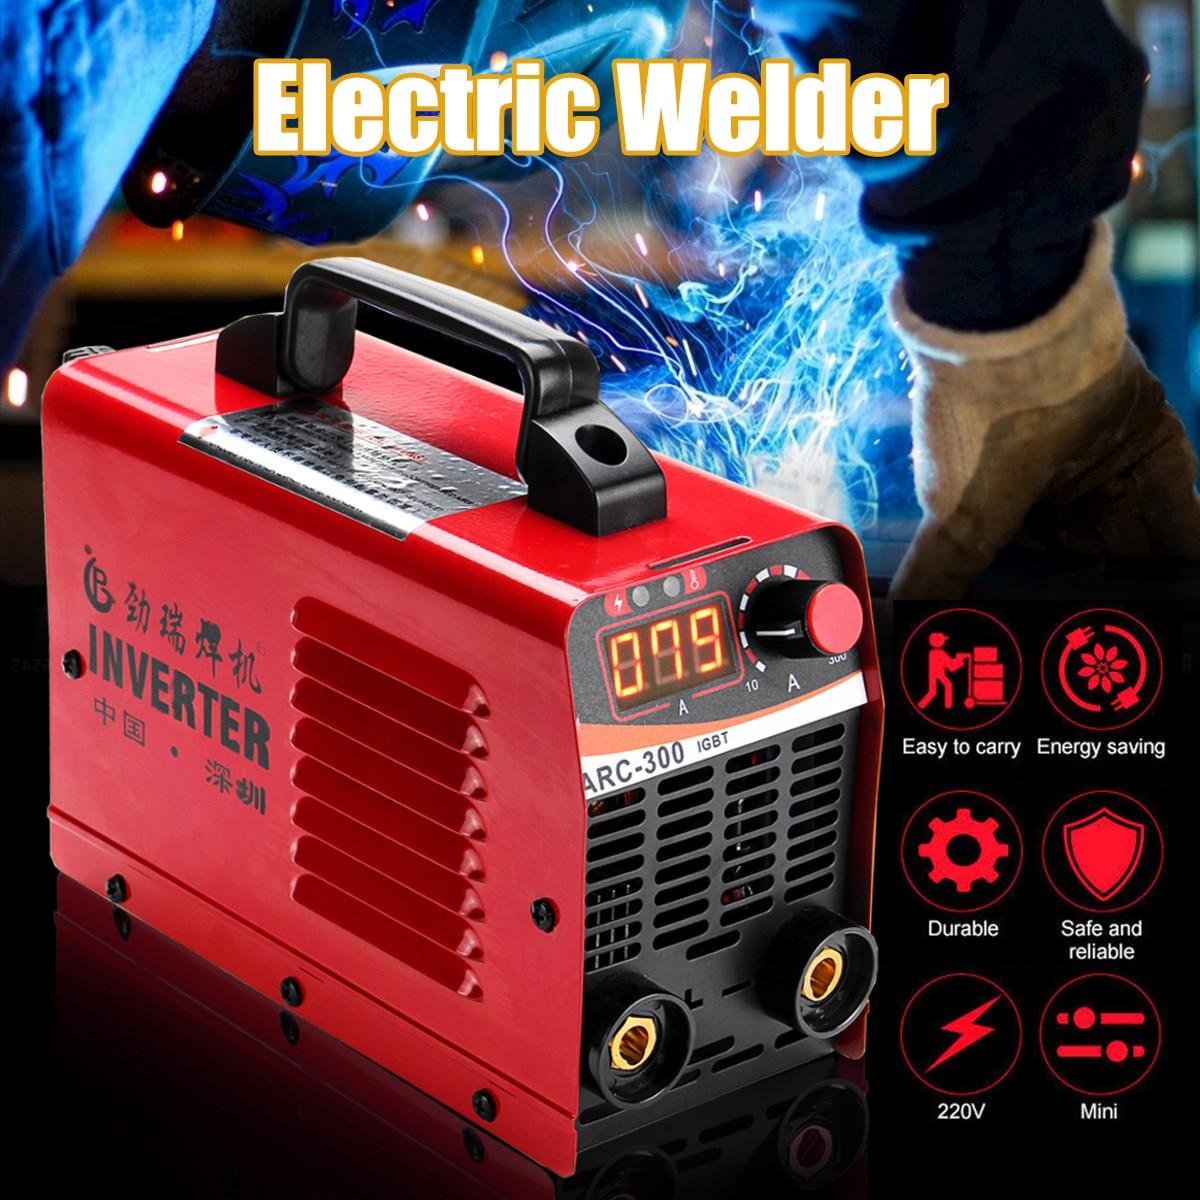 ARC-300 220V LCD Electric IGBT Inverter MMA ARC ZX7 Portable Welding Machine Arc Welders